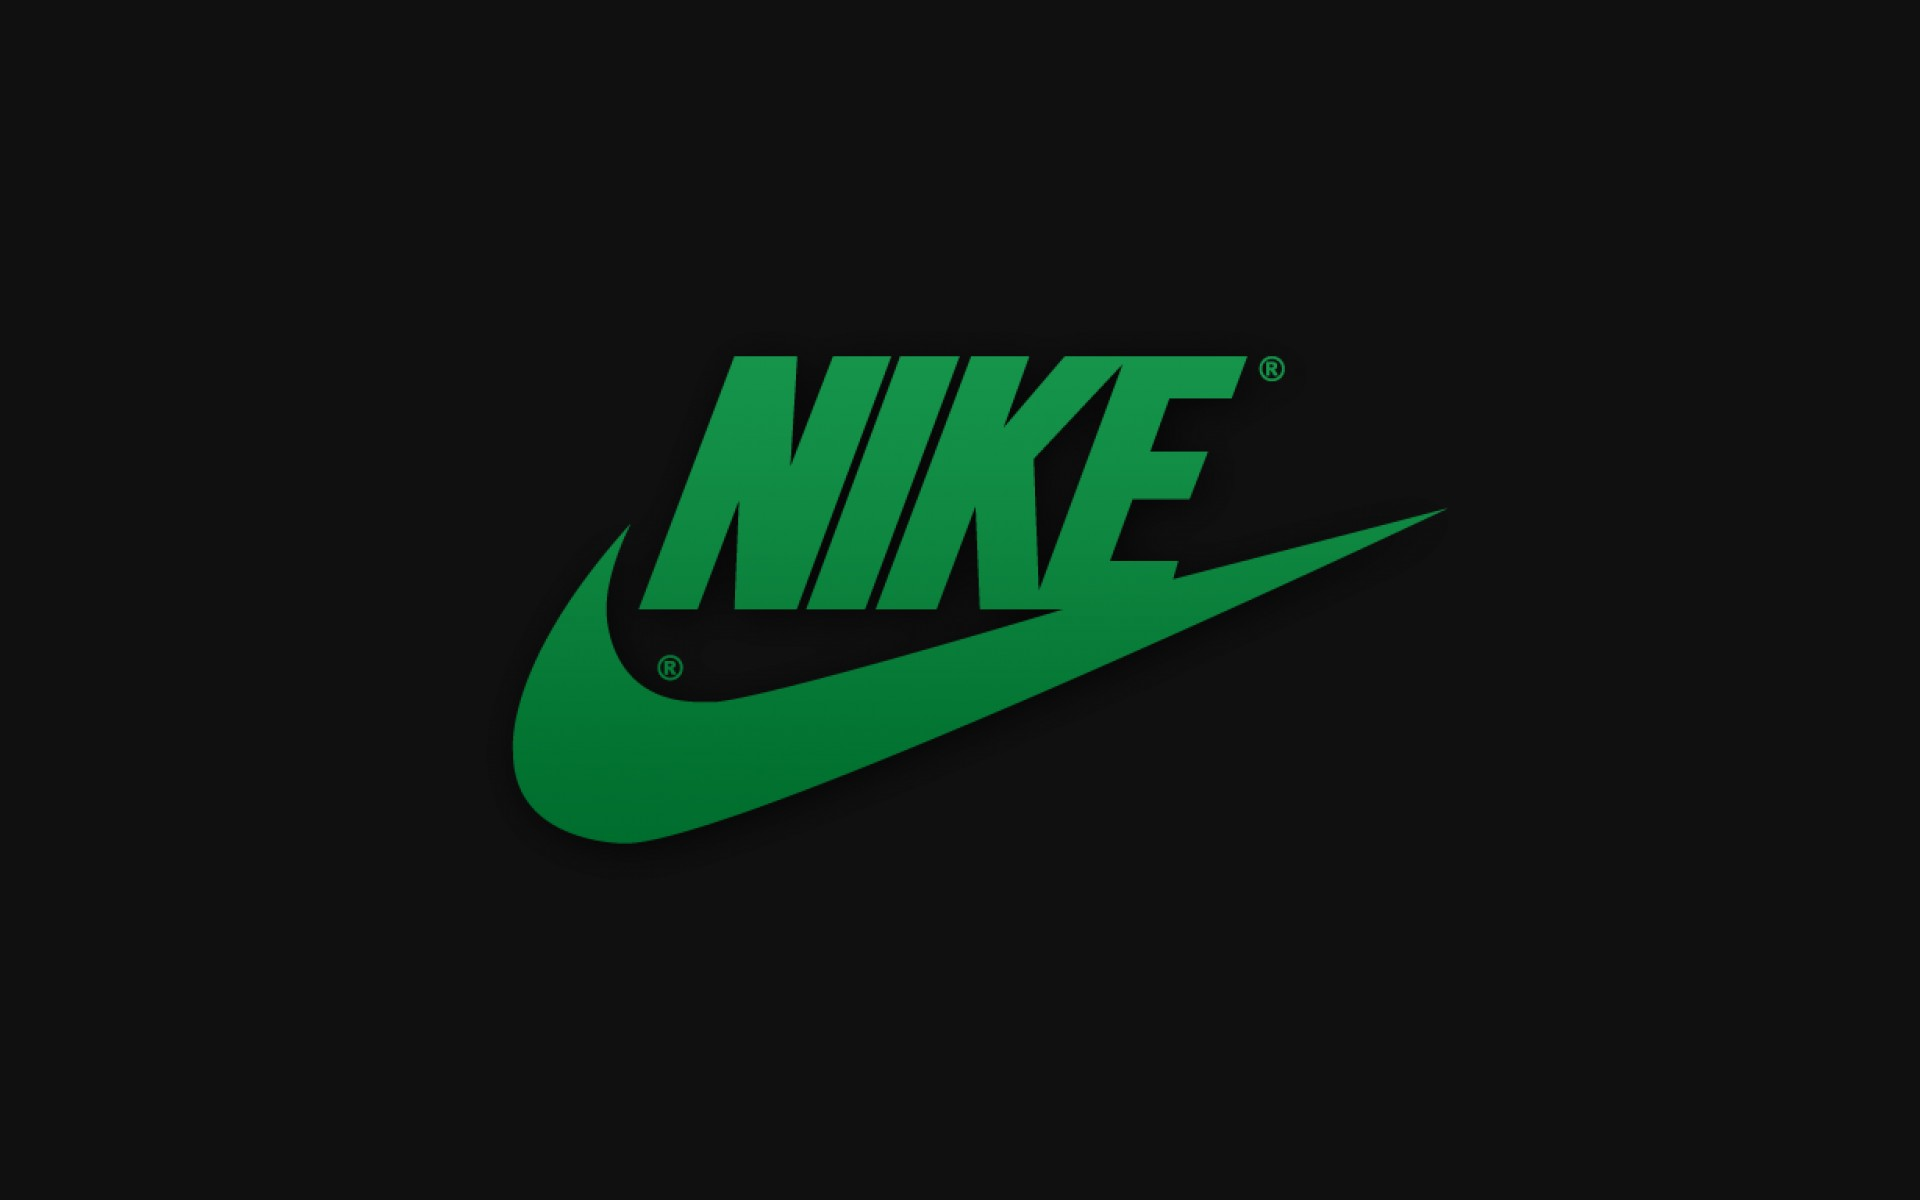 Nike Quotes Iphone Wallpaper Download Free Nike Sb Logo Wallpapers Pixelstalk Net